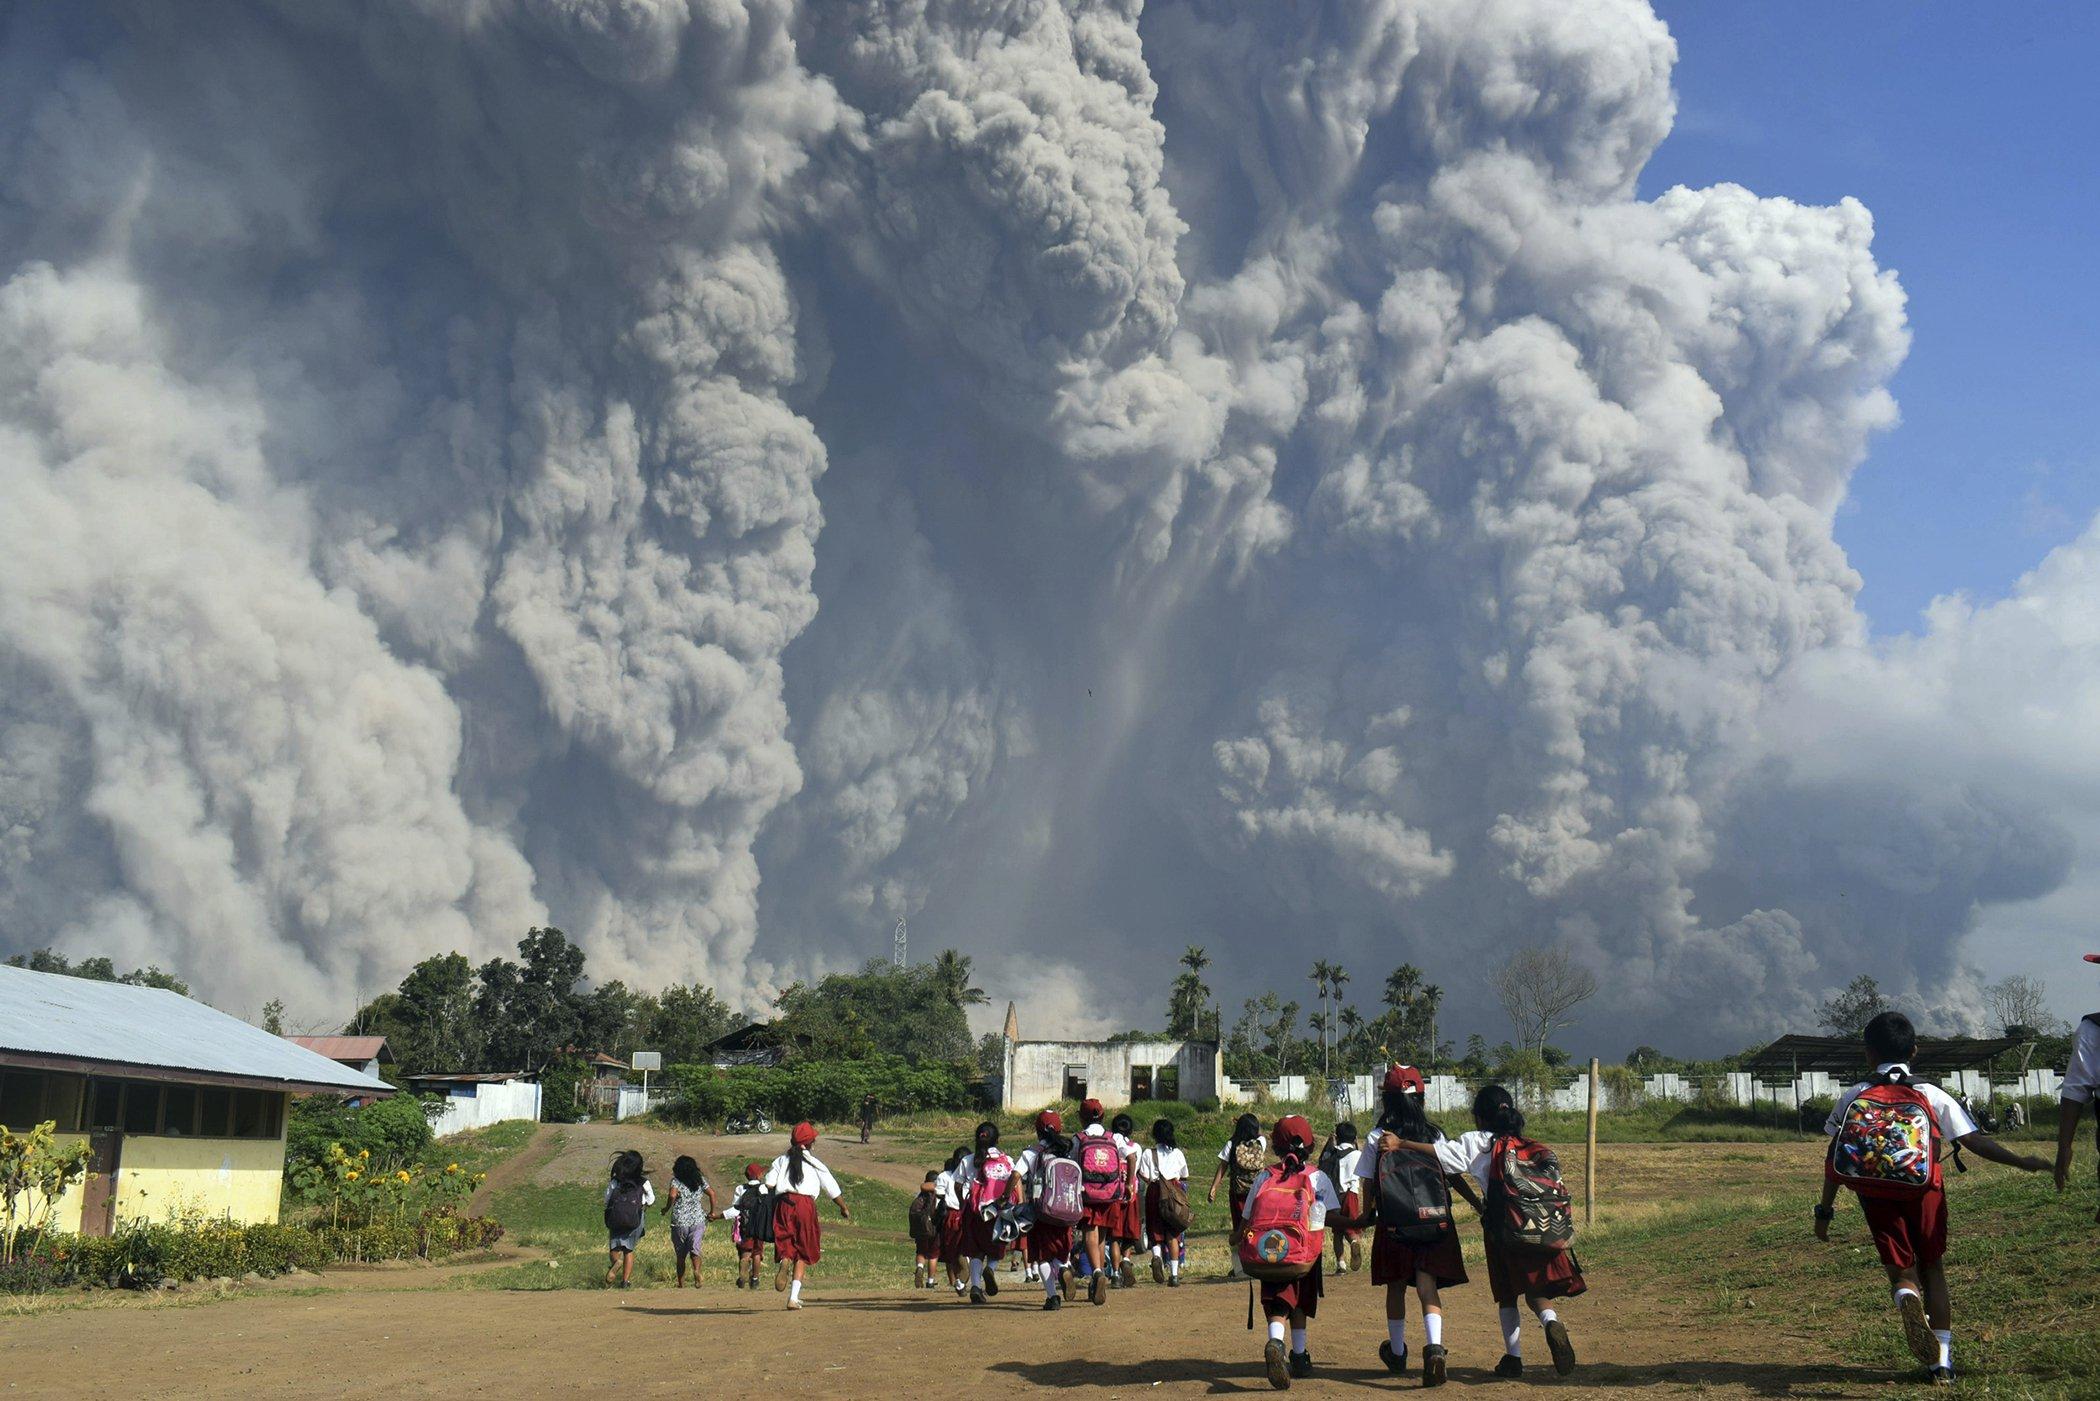 Mount-Sinabung-Volcano-Indonesia.jpg